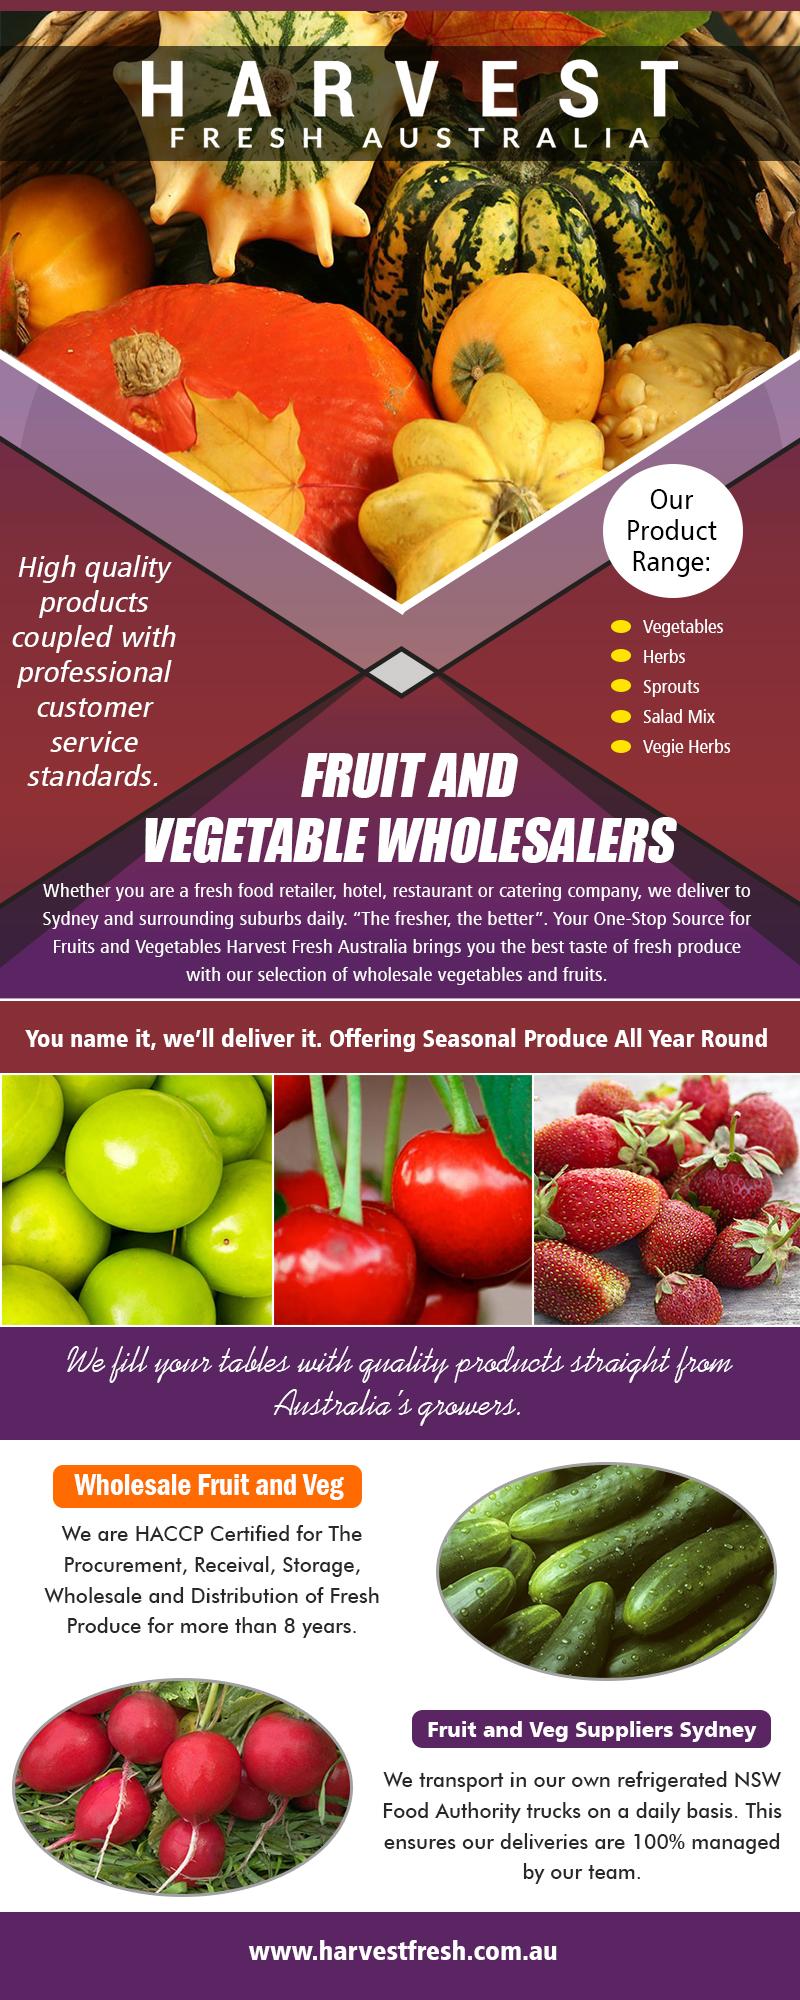 Fruit And Vegetable Wholesalers Sydney | Call – 02 9746 6503 | harvestfresh.com.au